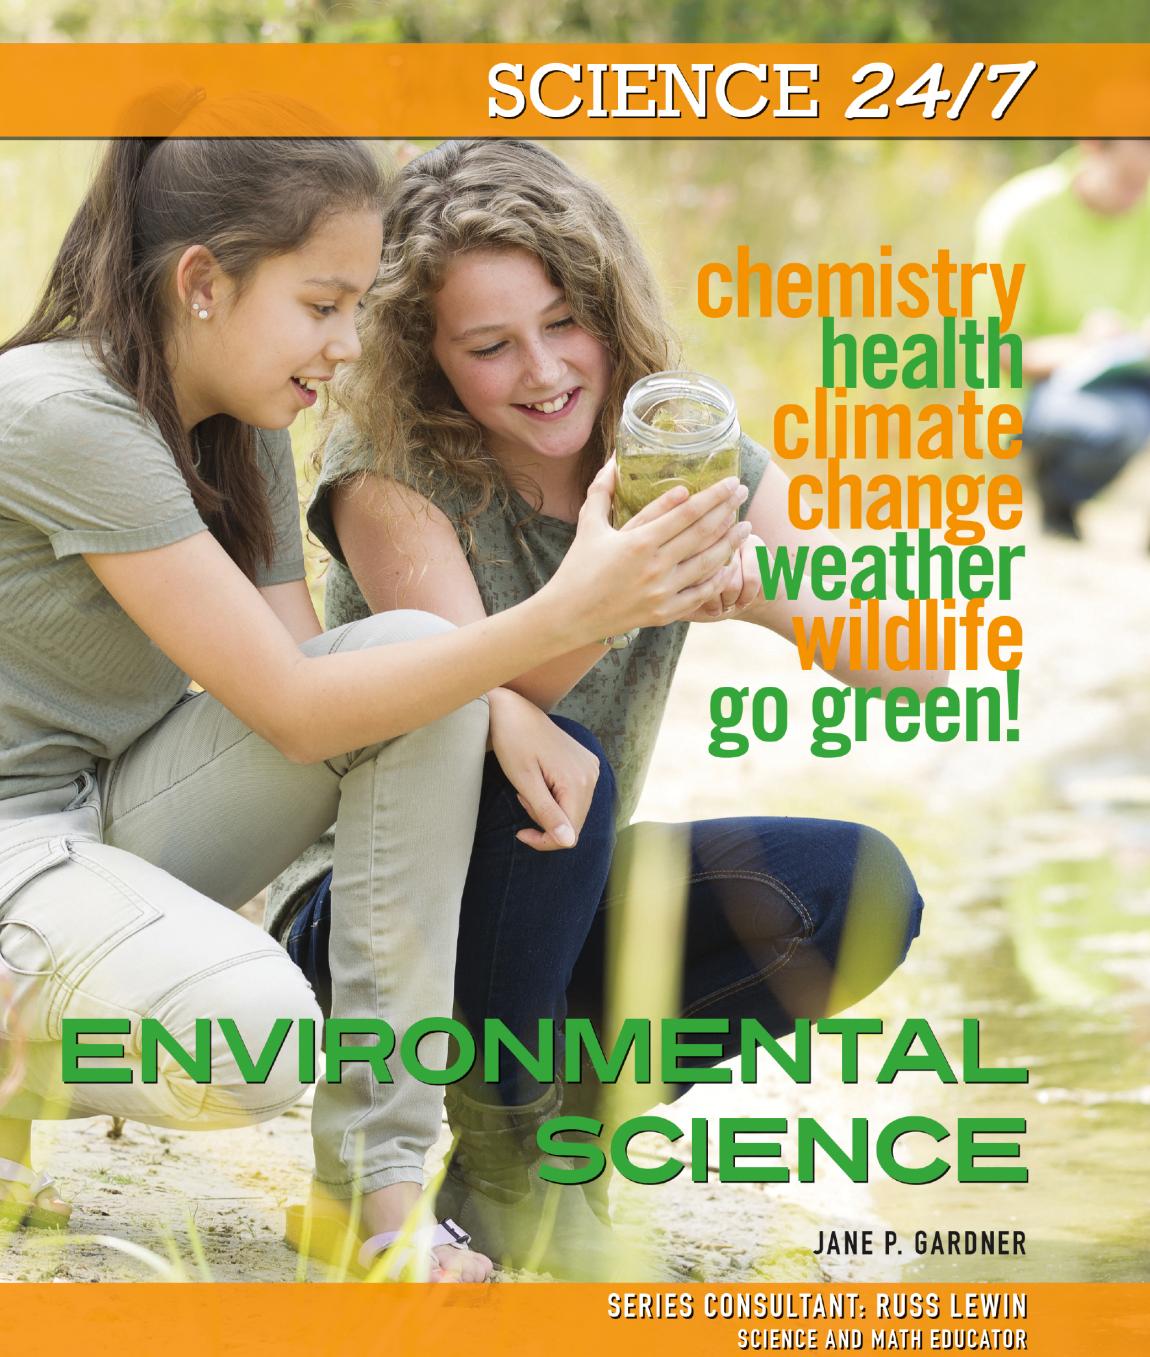 environmental-science-01.png